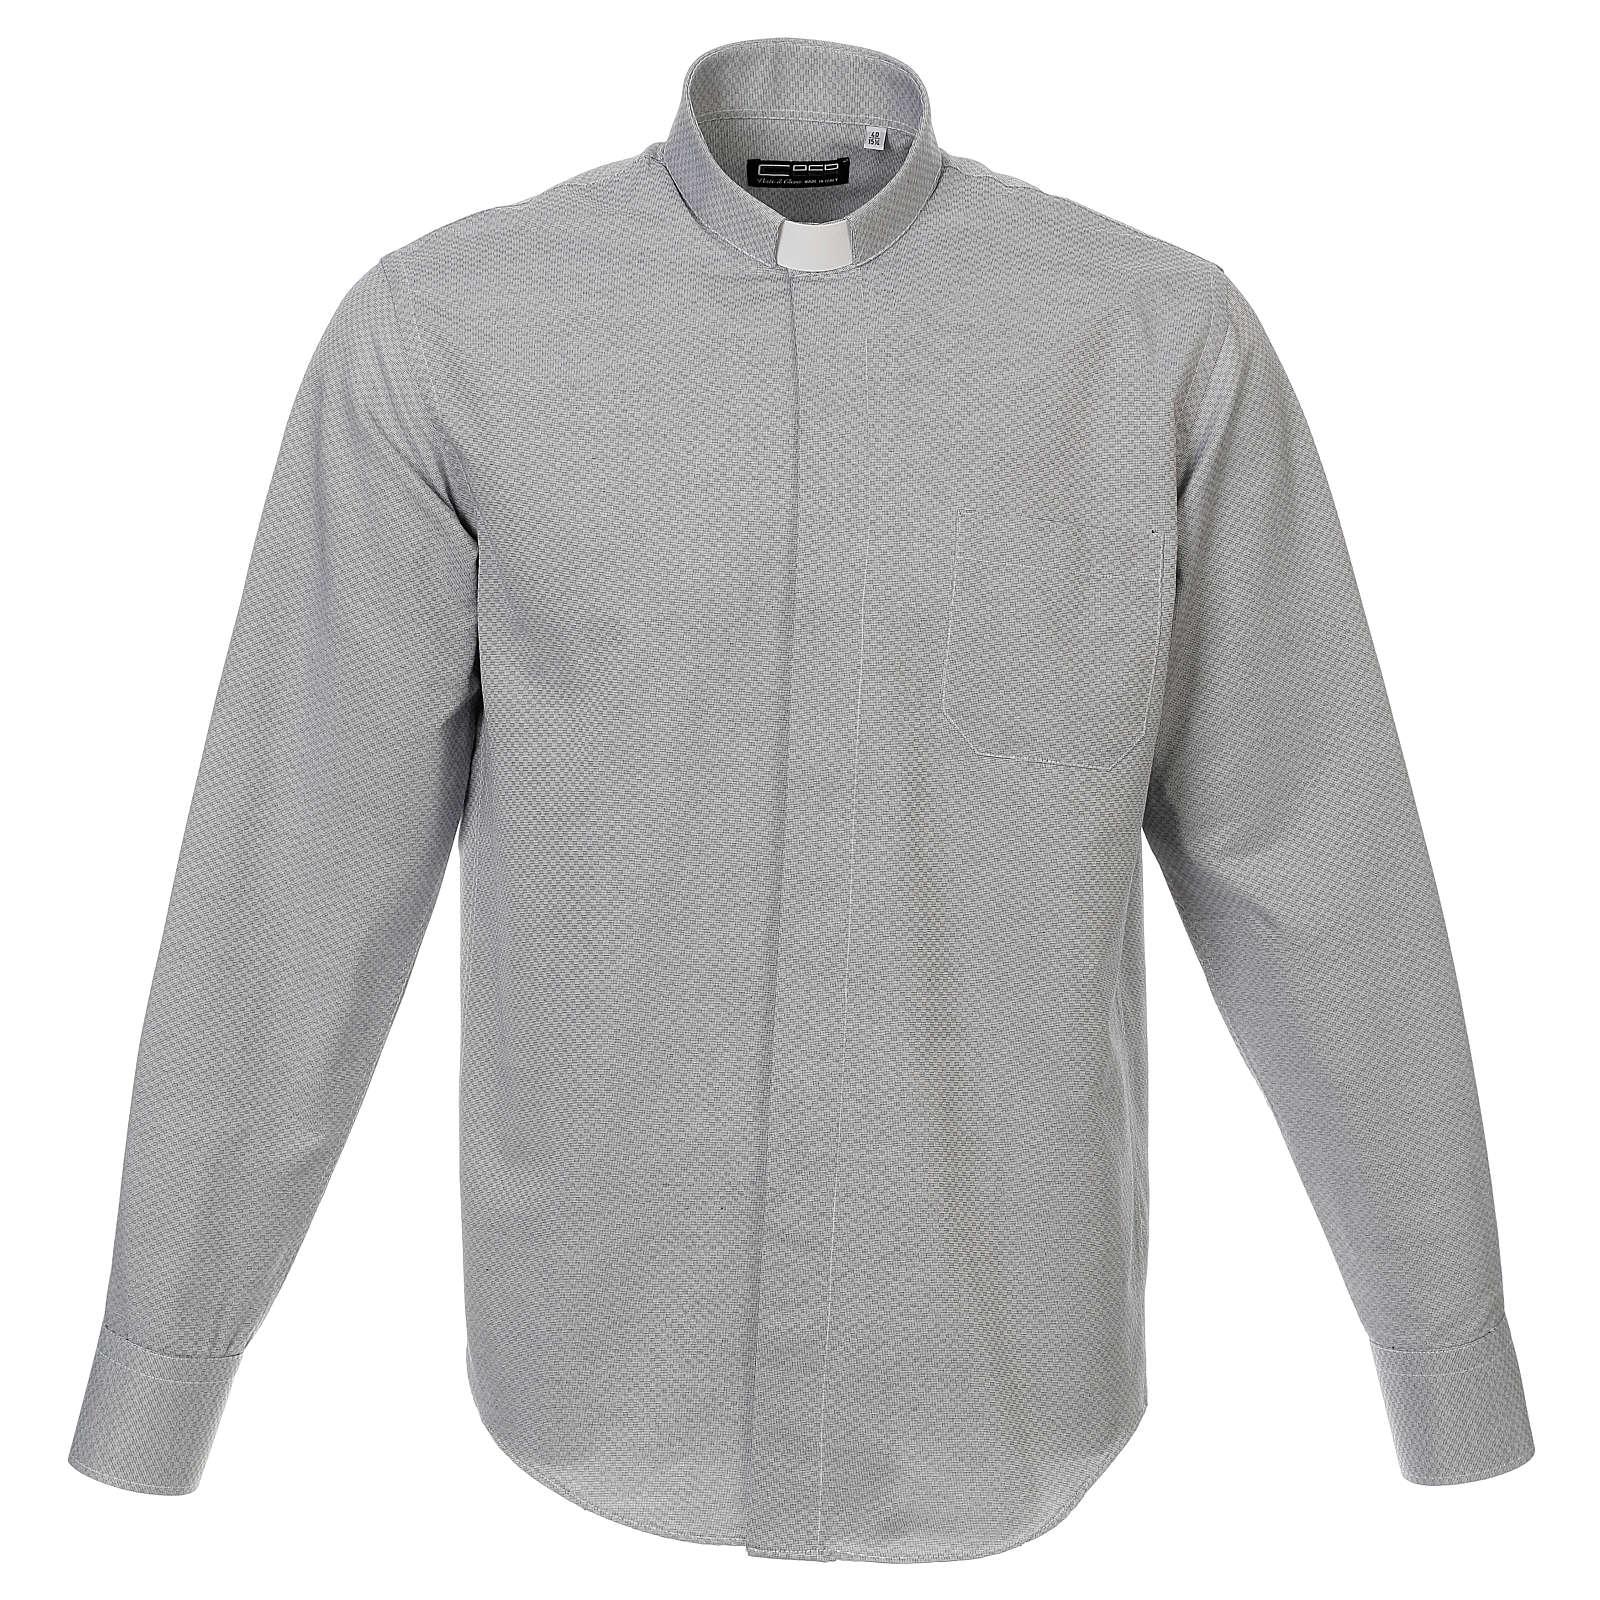 Collarhemd, Schachbrettmusterung, Baumwoll-Polyester-Mischgewebe, Farbe grau, Langarm 4